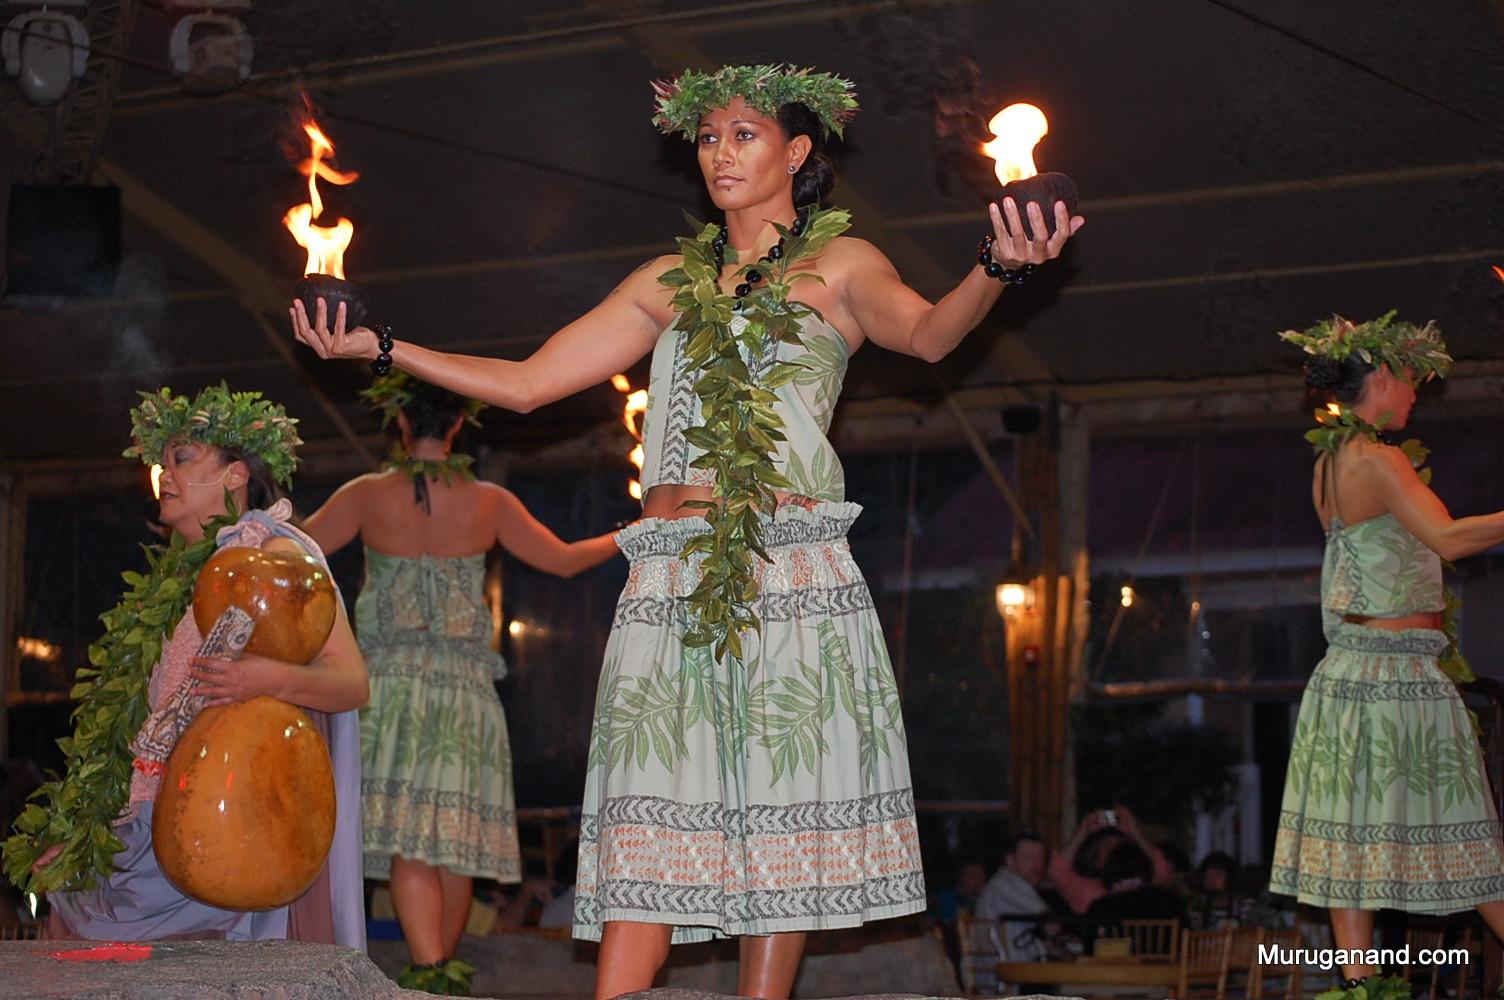 Beginning of Luau Performance (Kauai)